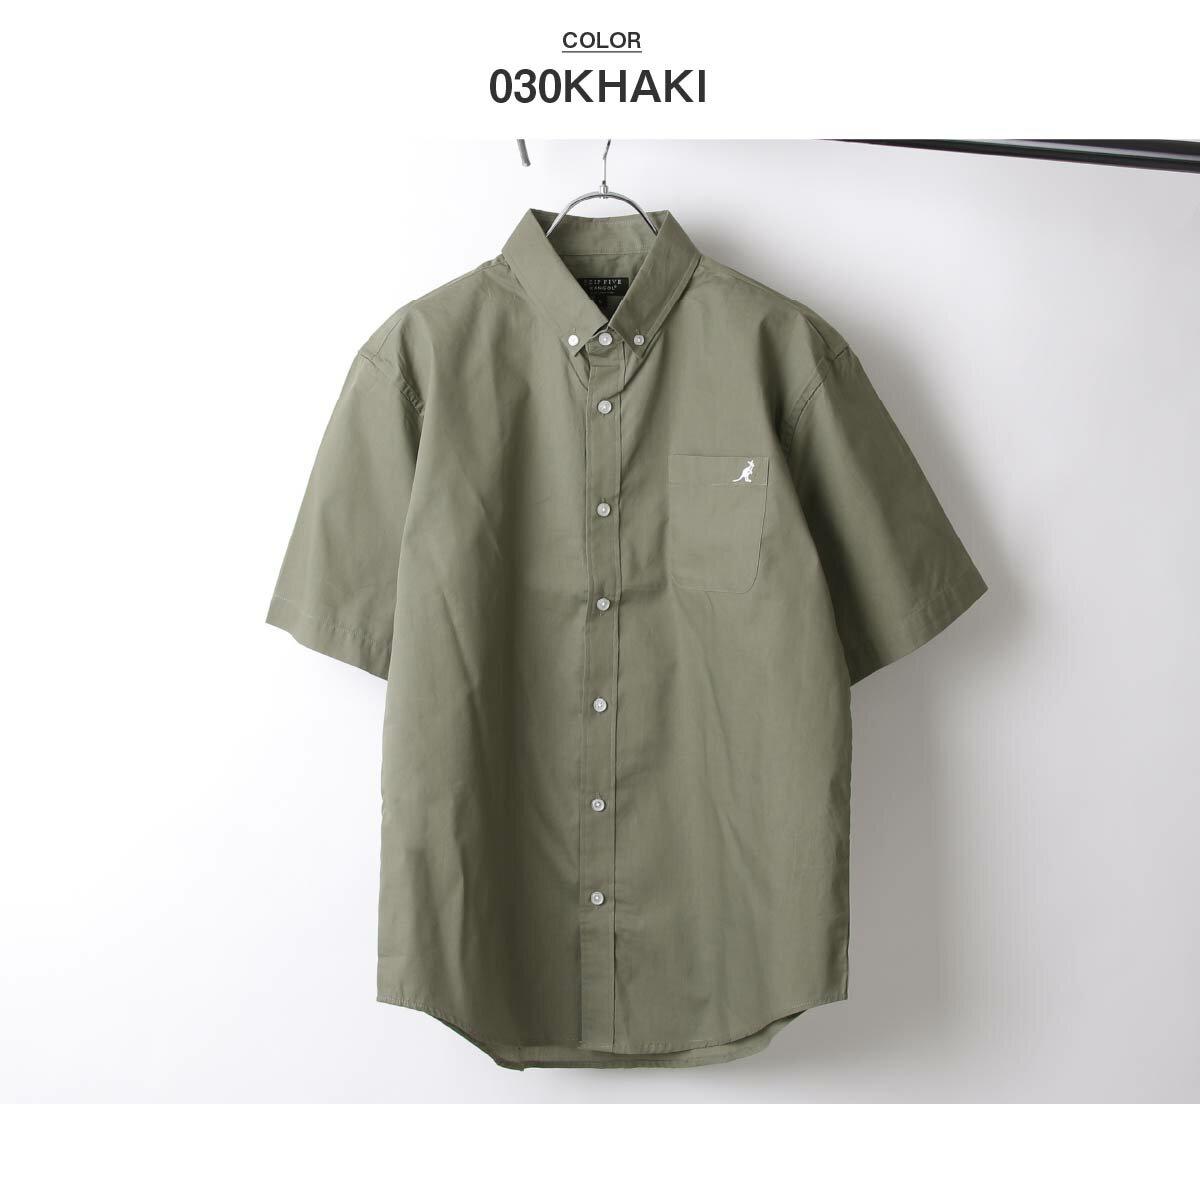 KANGOL短袖襯衫 特注款 KANGOL 袋鼠 4